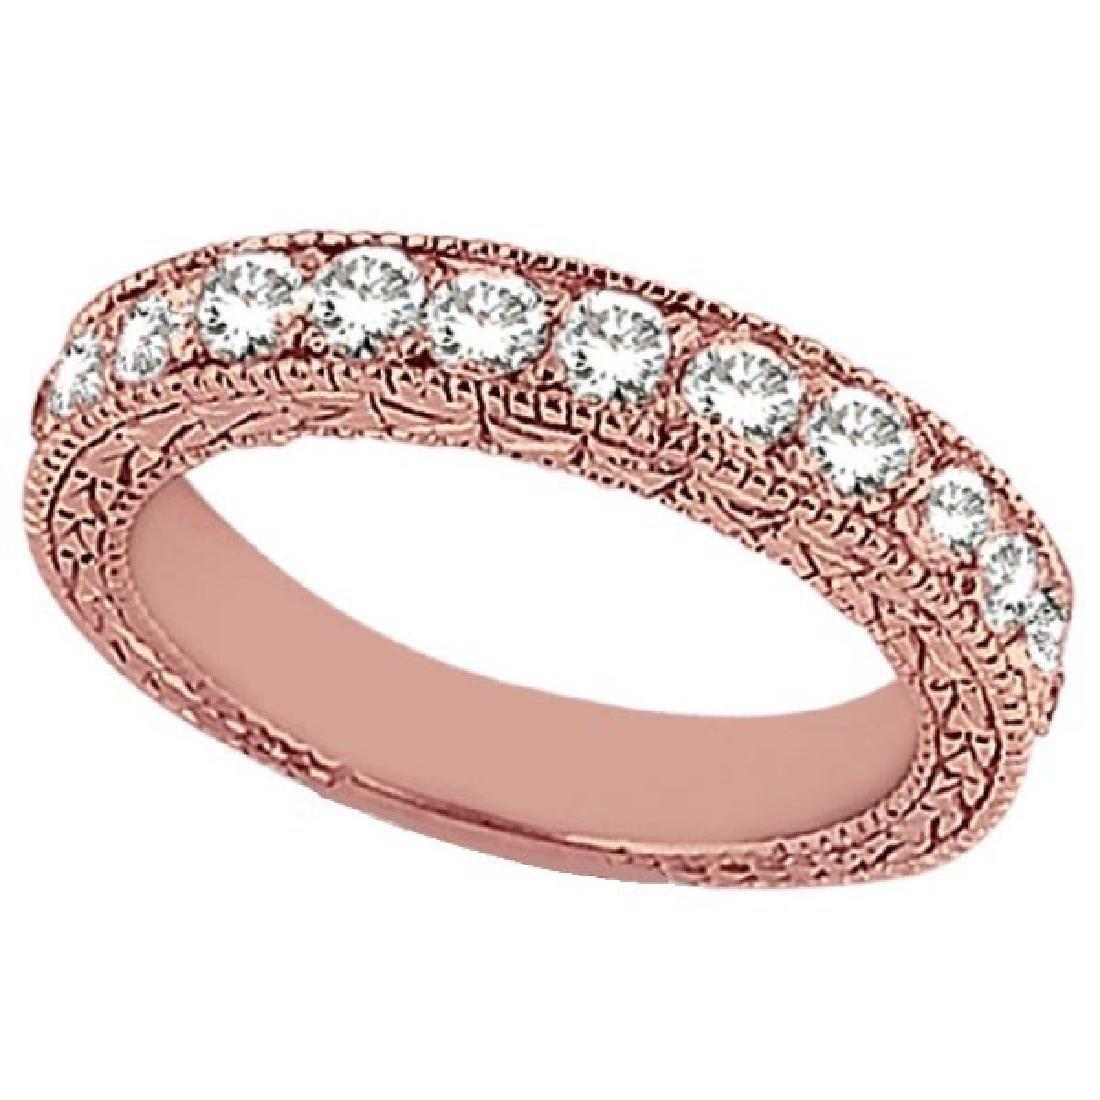 Antique Style Pave Set Wedding Ring Band 14k Rose Gold